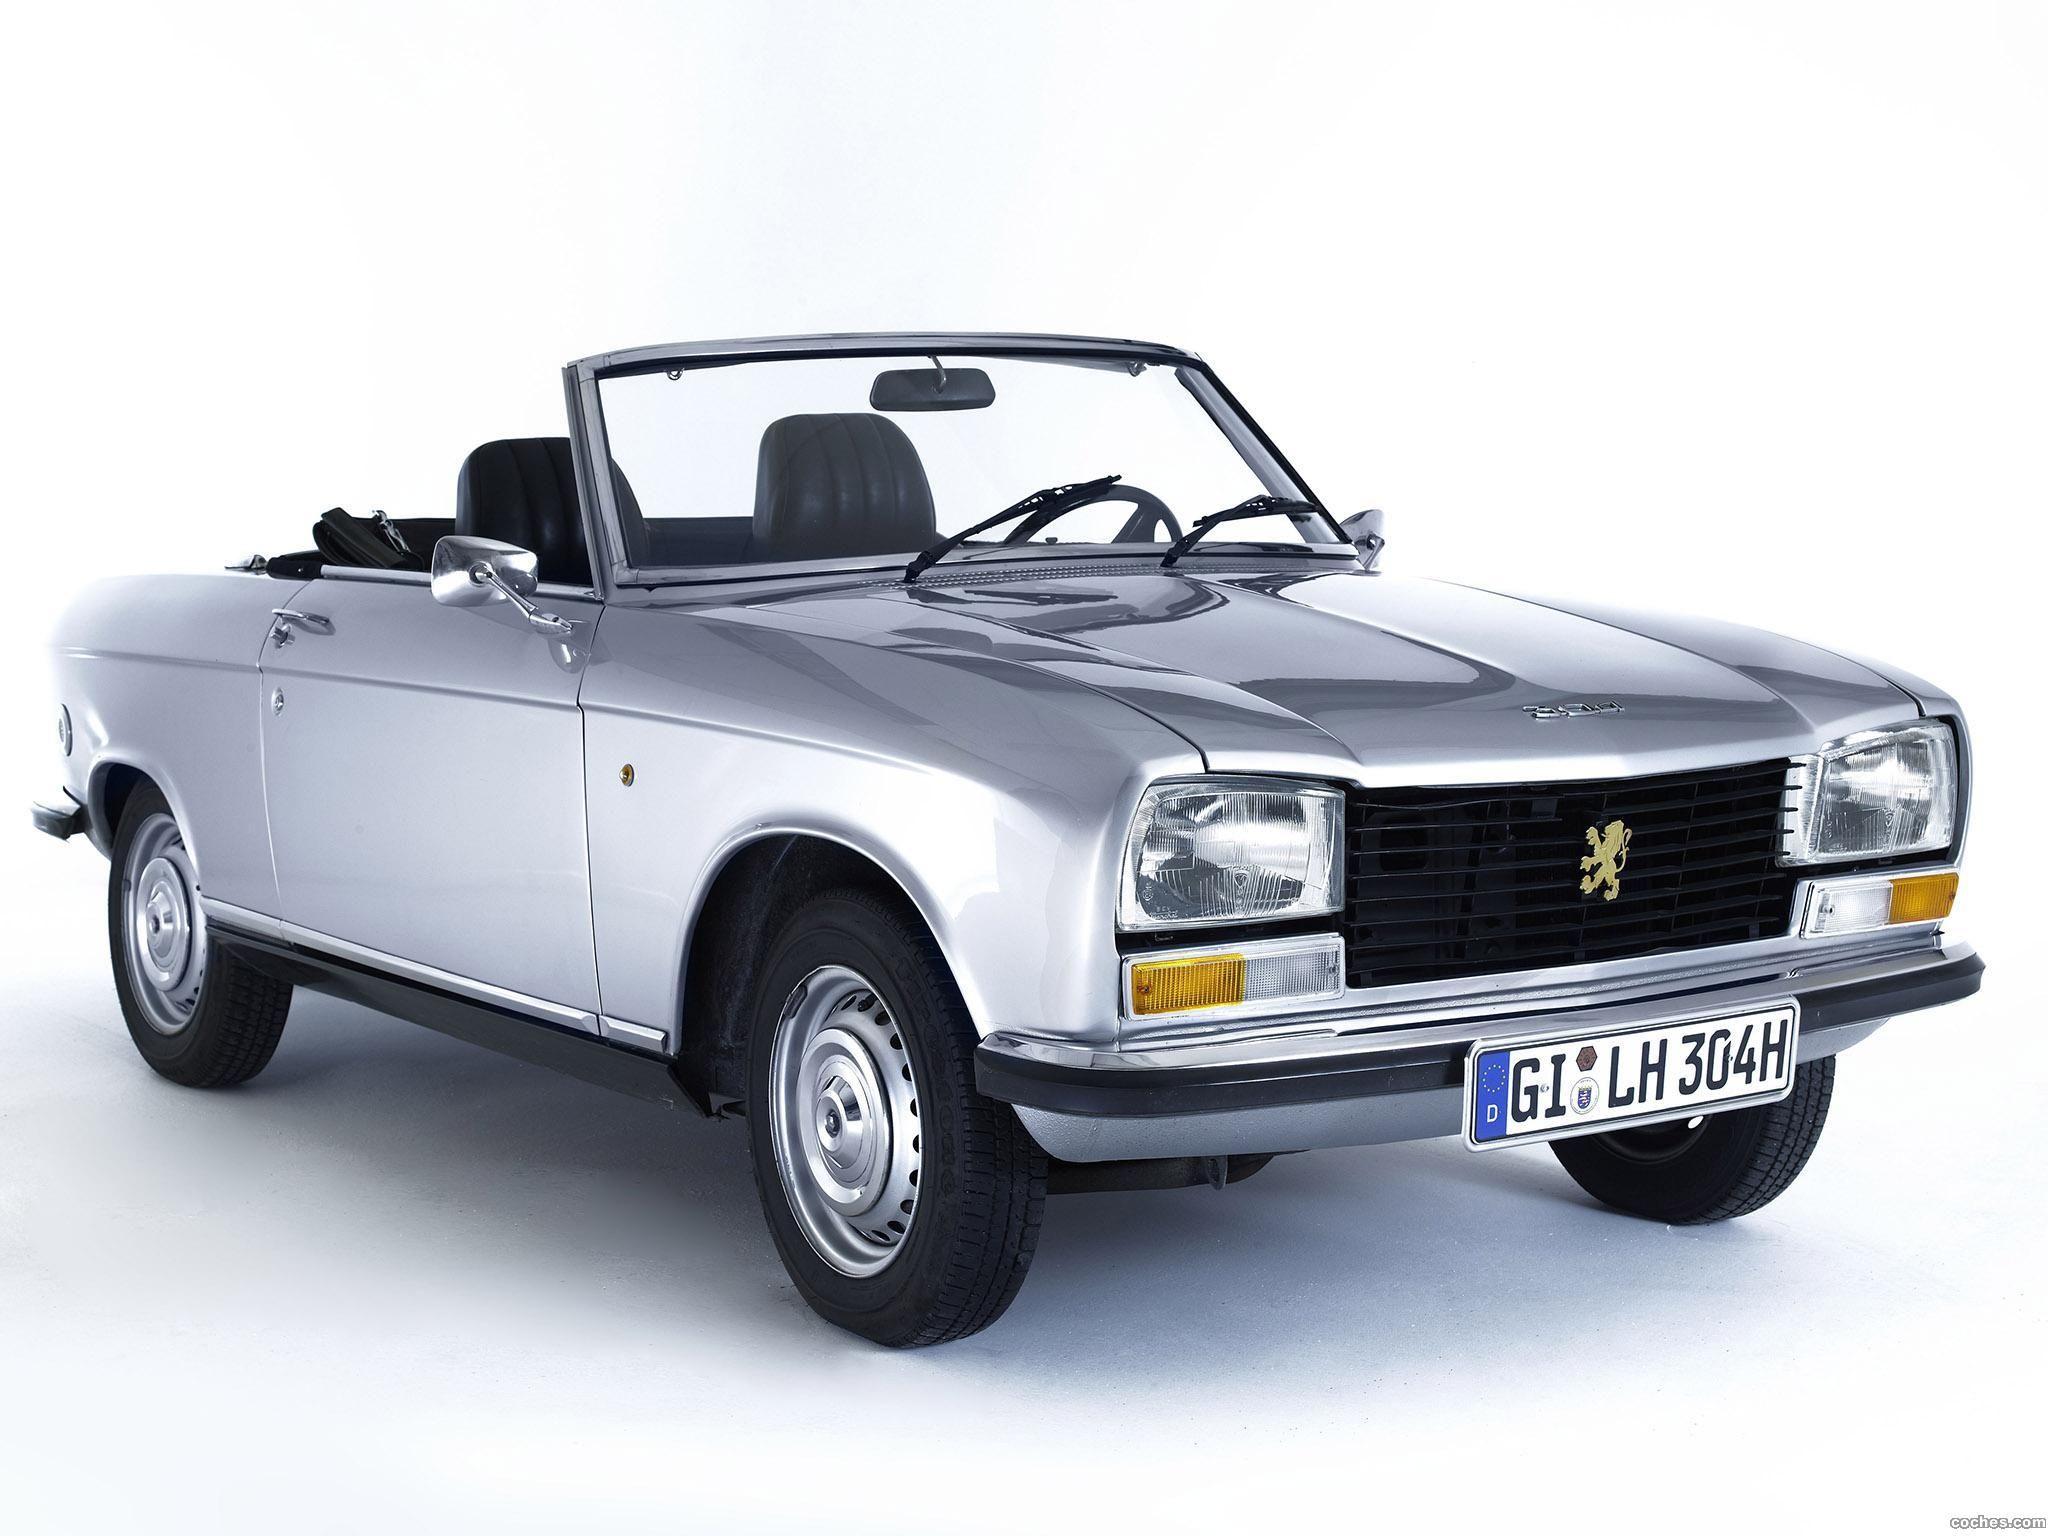 peugeot 304 cabriolet bella macchina pinterest peugeot cars and wheels. Black Bedroom Furniture Sets. Home Design Ideas